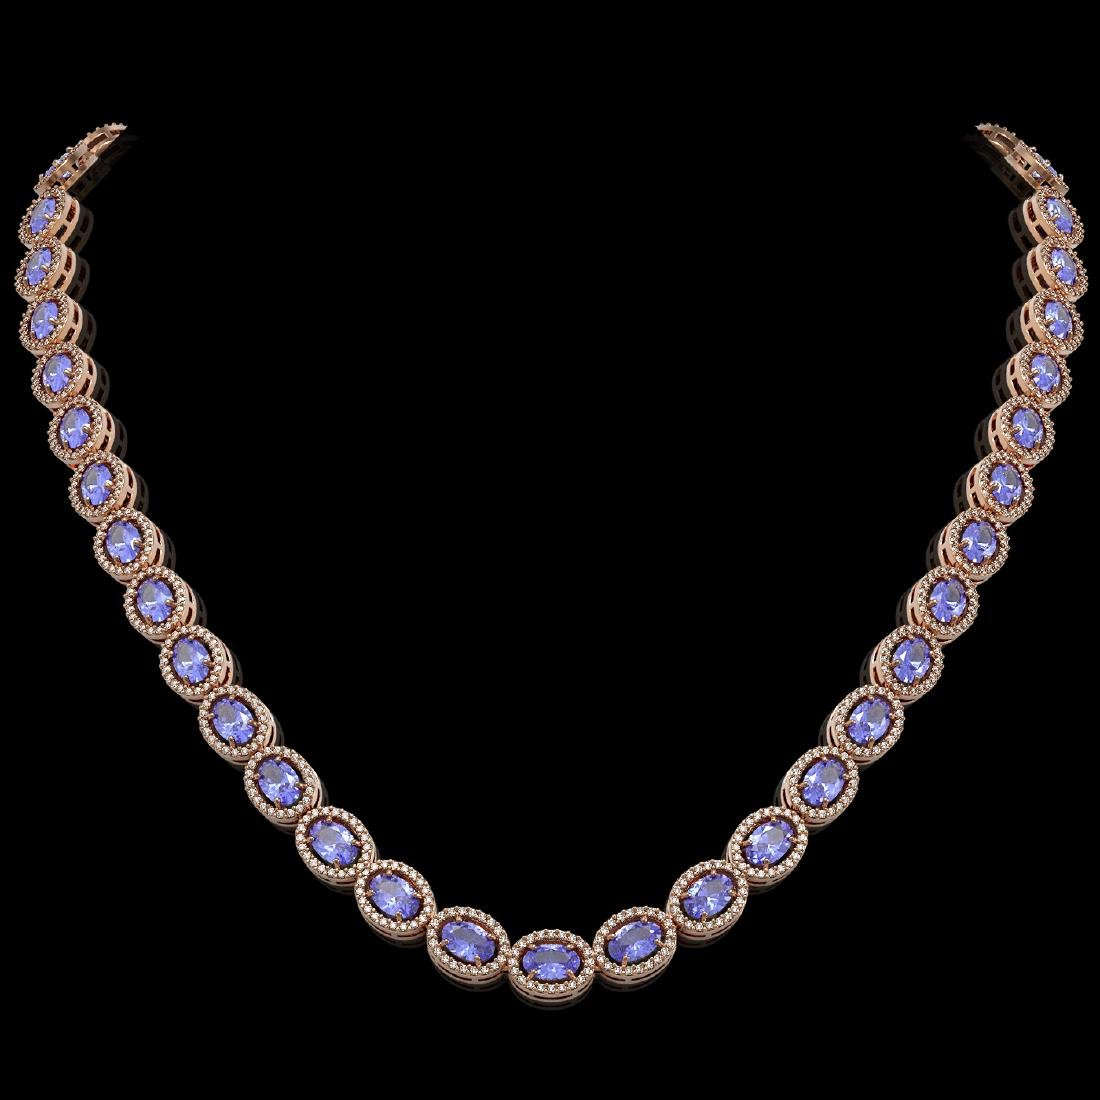 31.96 CTW Tanzanite & Diamond Halo Necklace 10K Rose